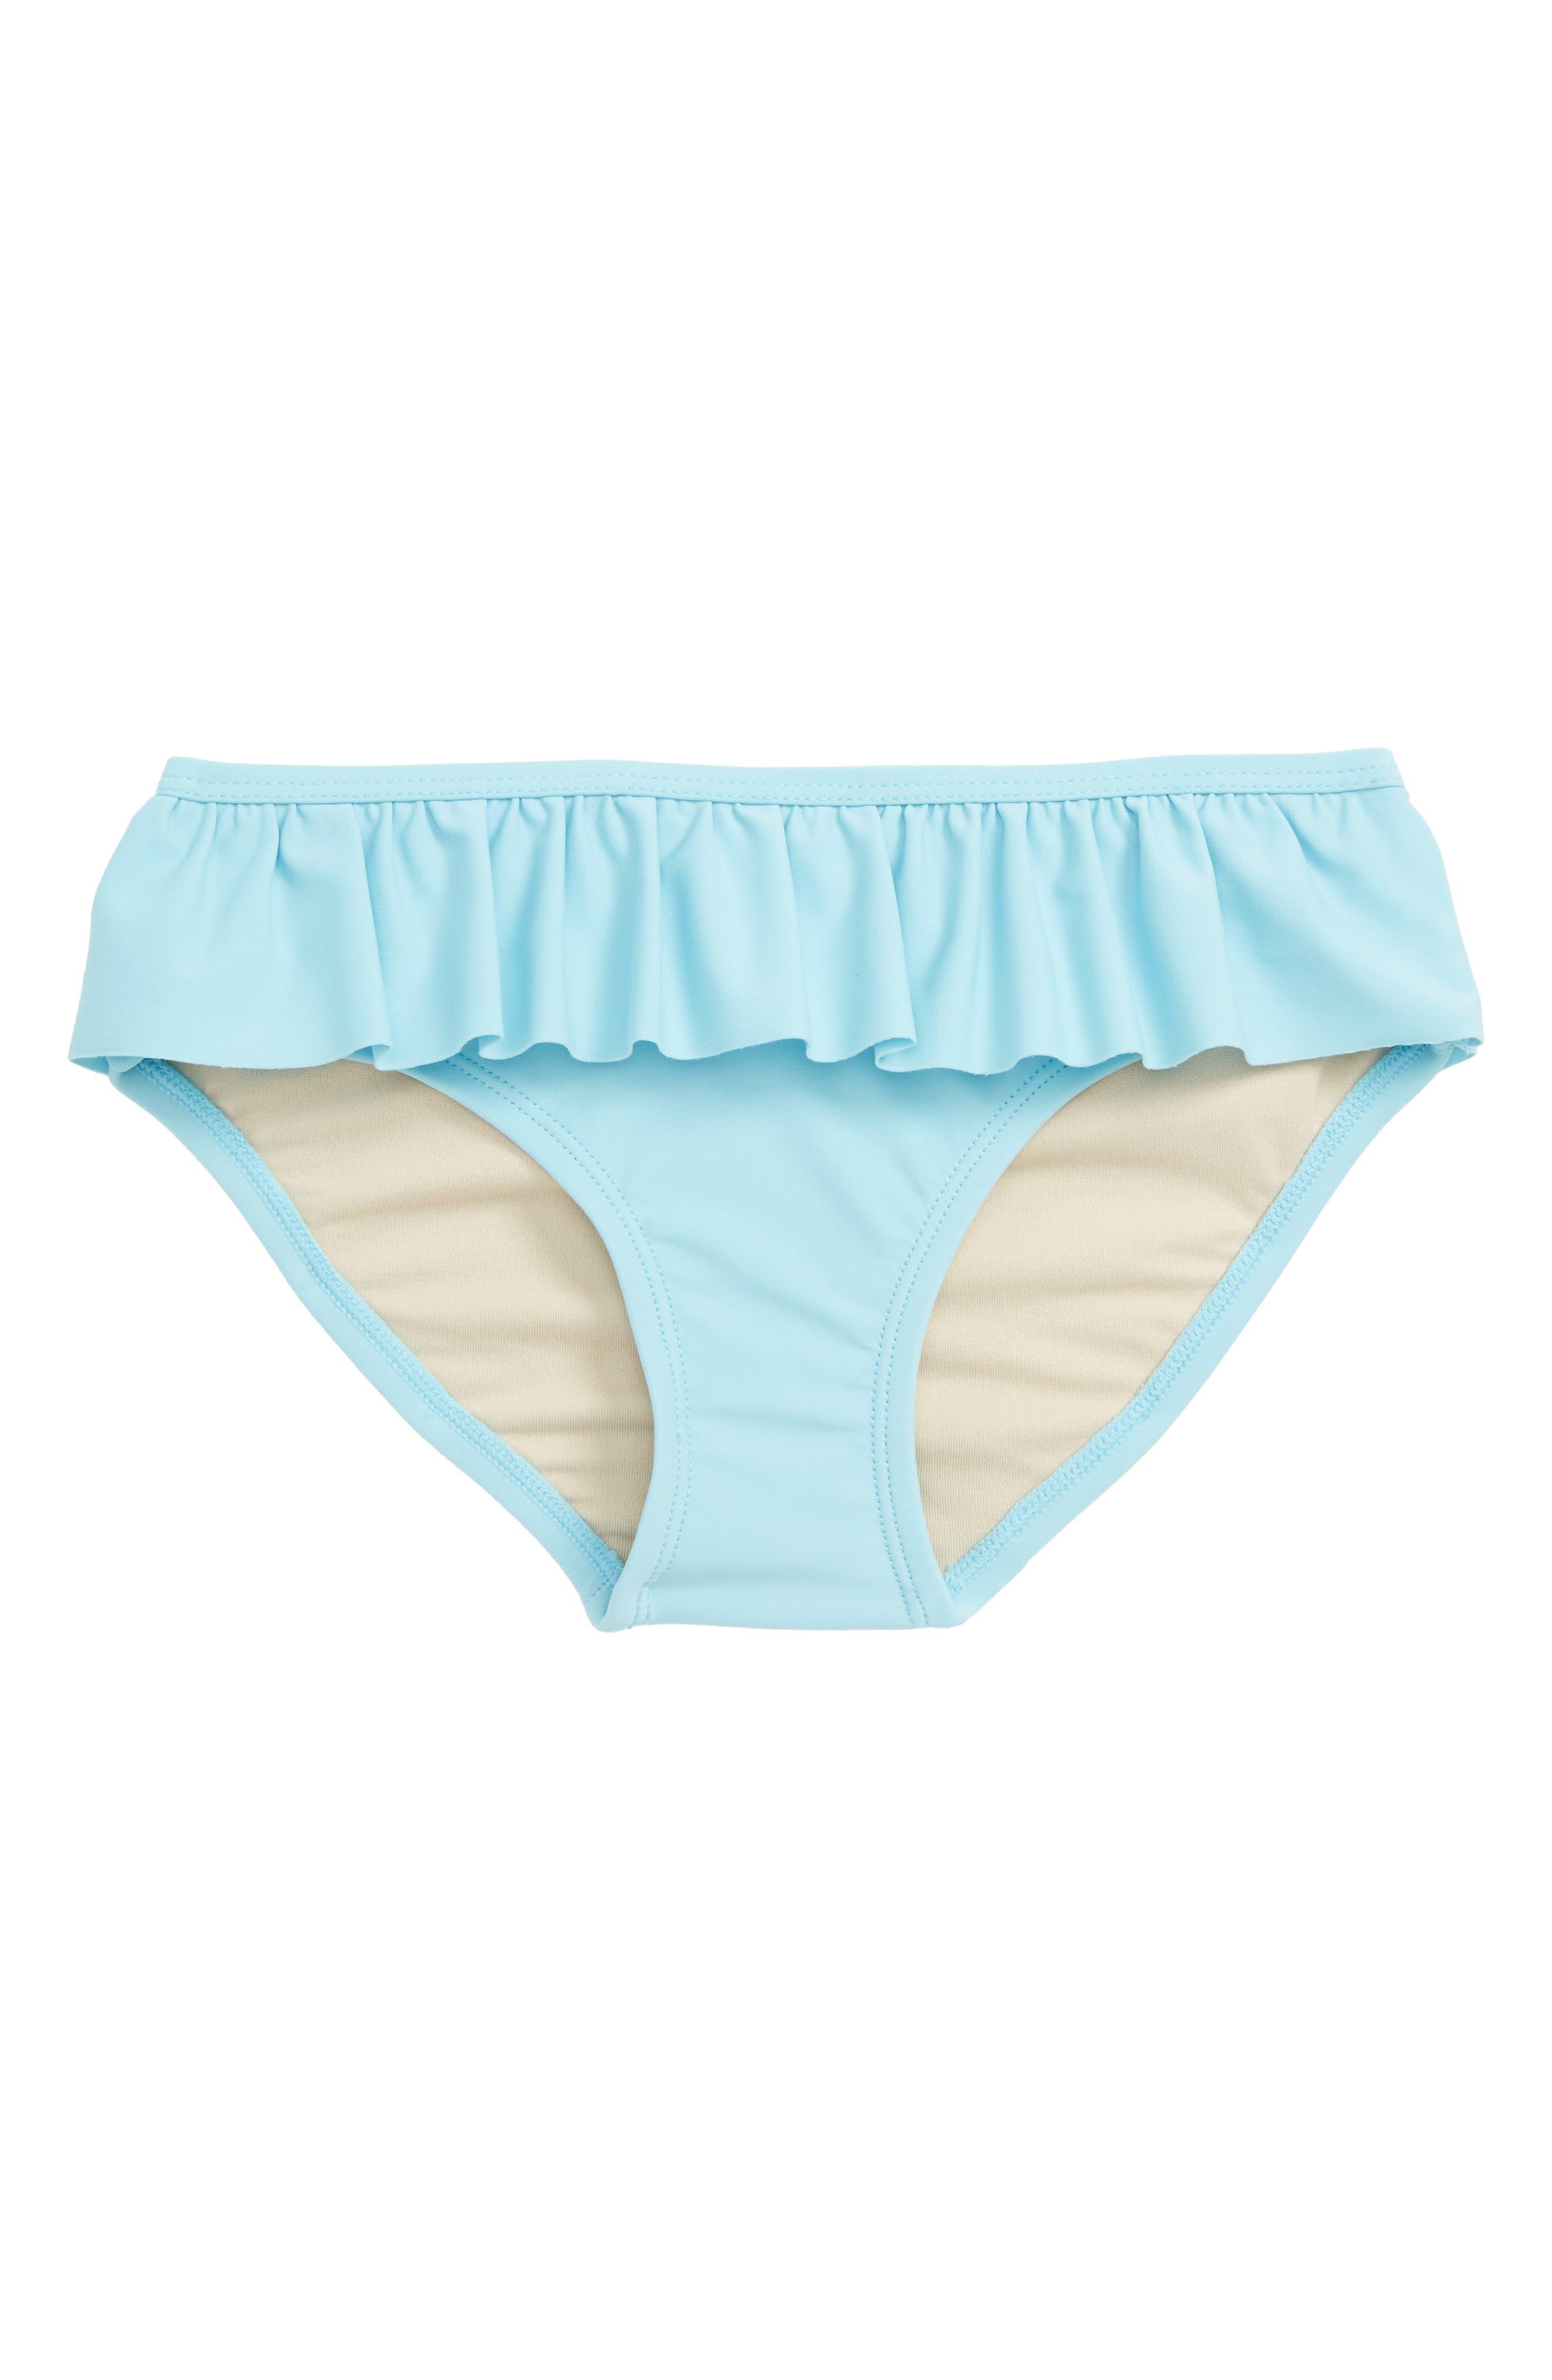 TEA COLLECTION,                             Ruffle Bikini Bottoms,                             Main thumbnail 1, color,                             ROBINS EGG